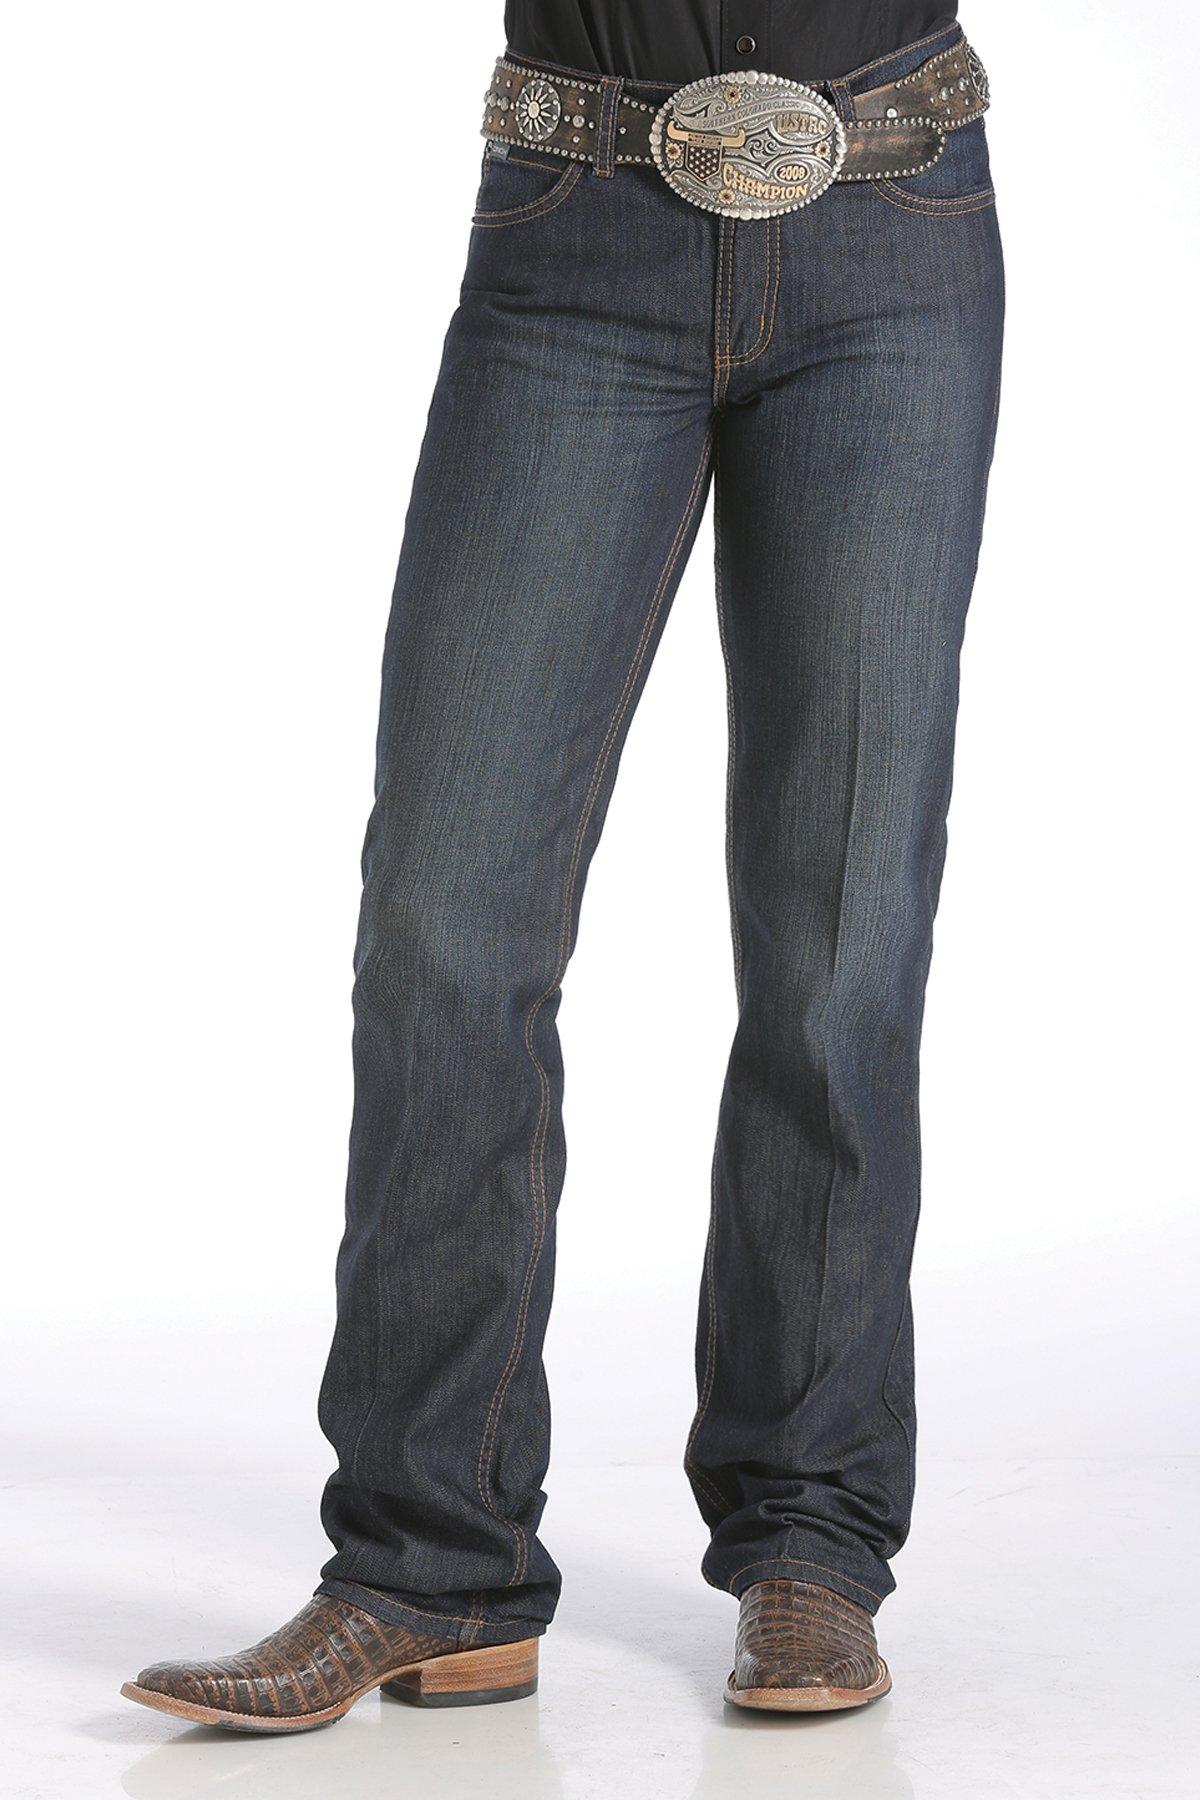 jeans-western-femme-jenna-cinch-devant-MJ80153071